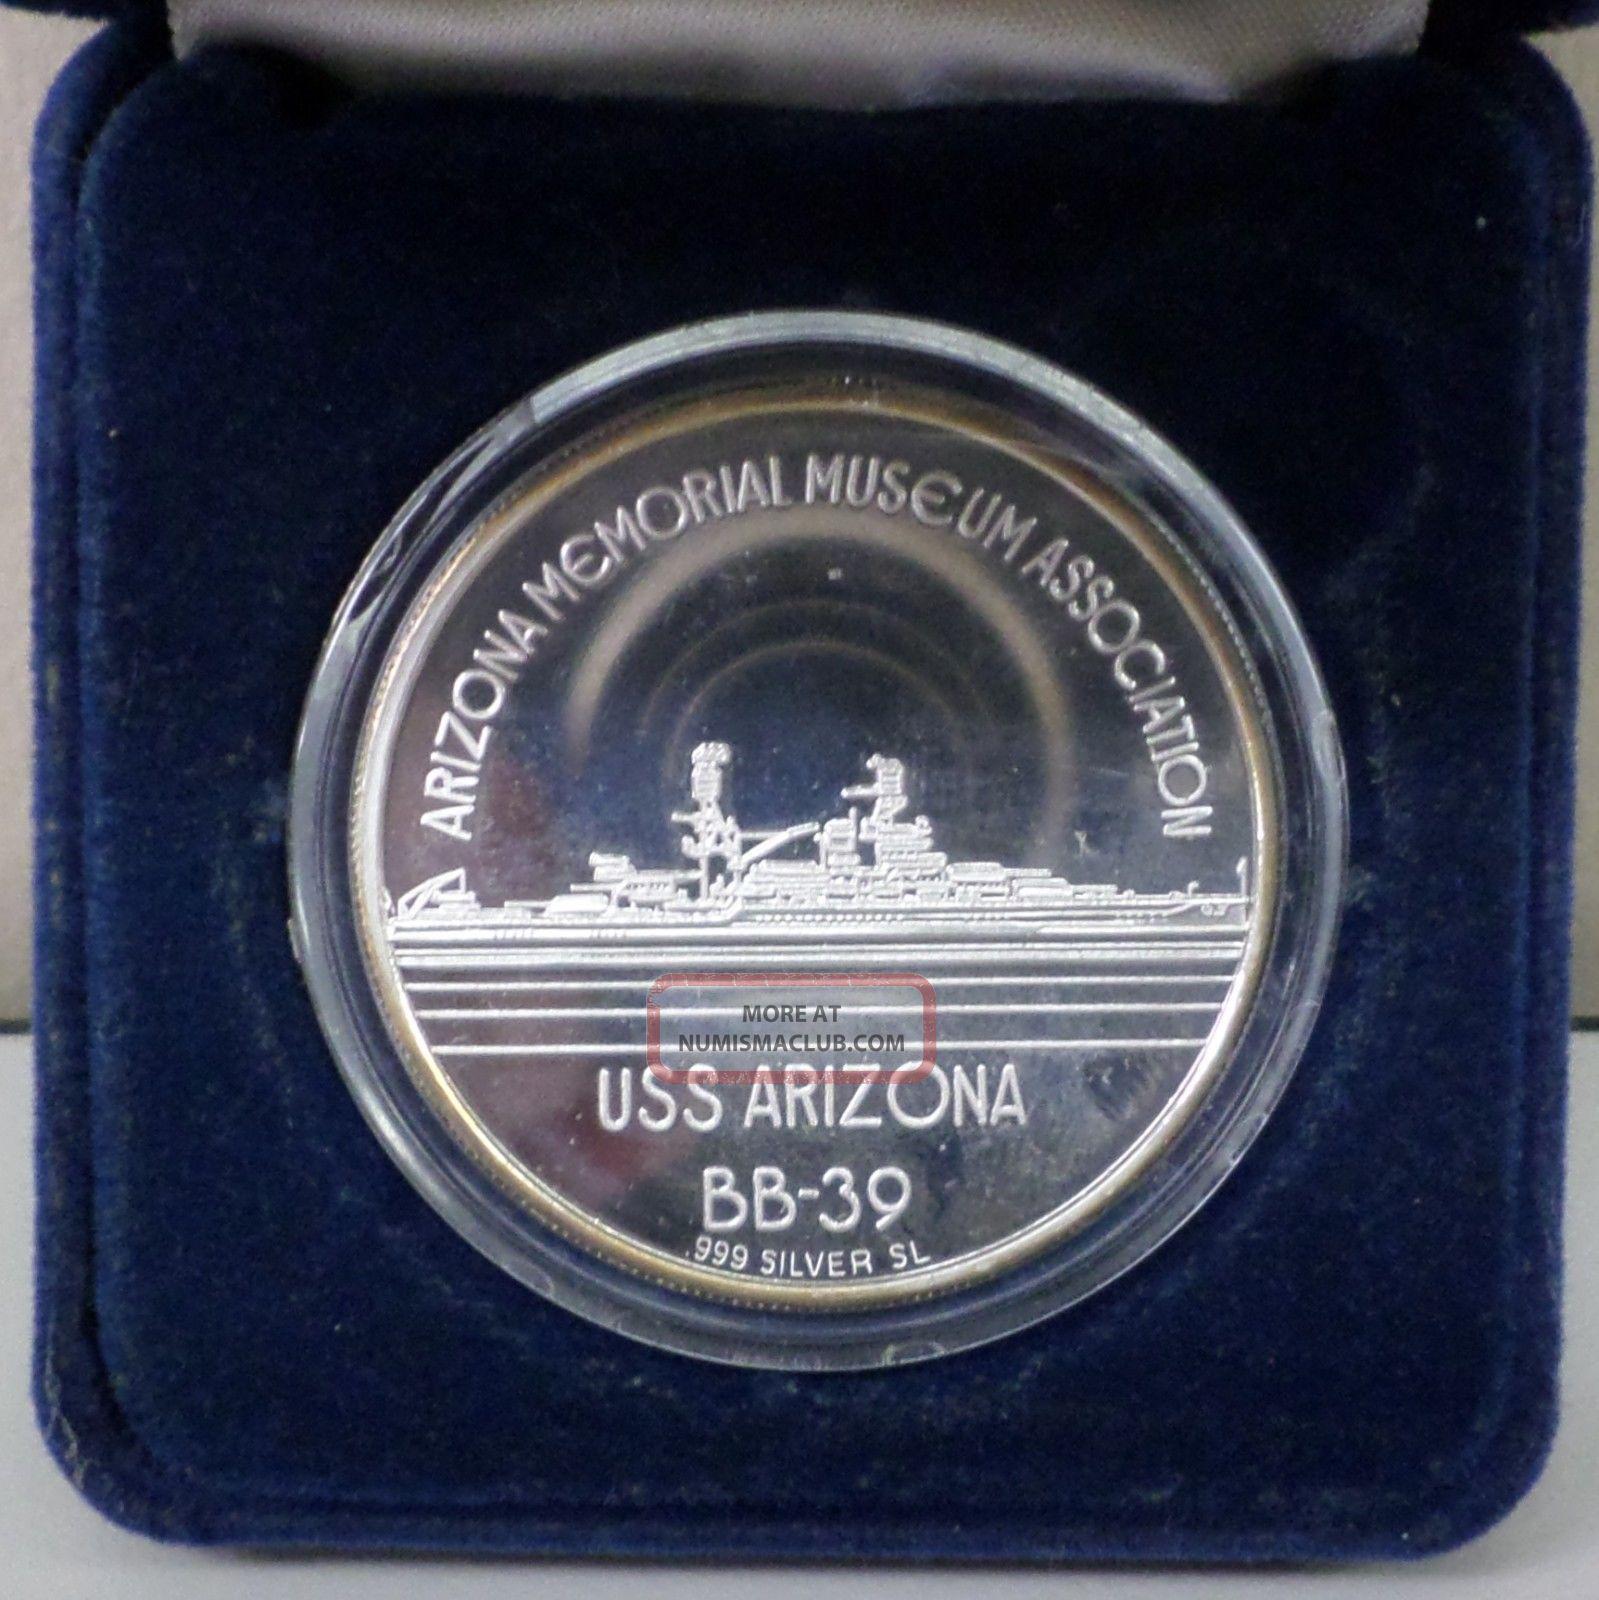 Uss Arizona Pearl Harbor Museum Association Dec 7 1941